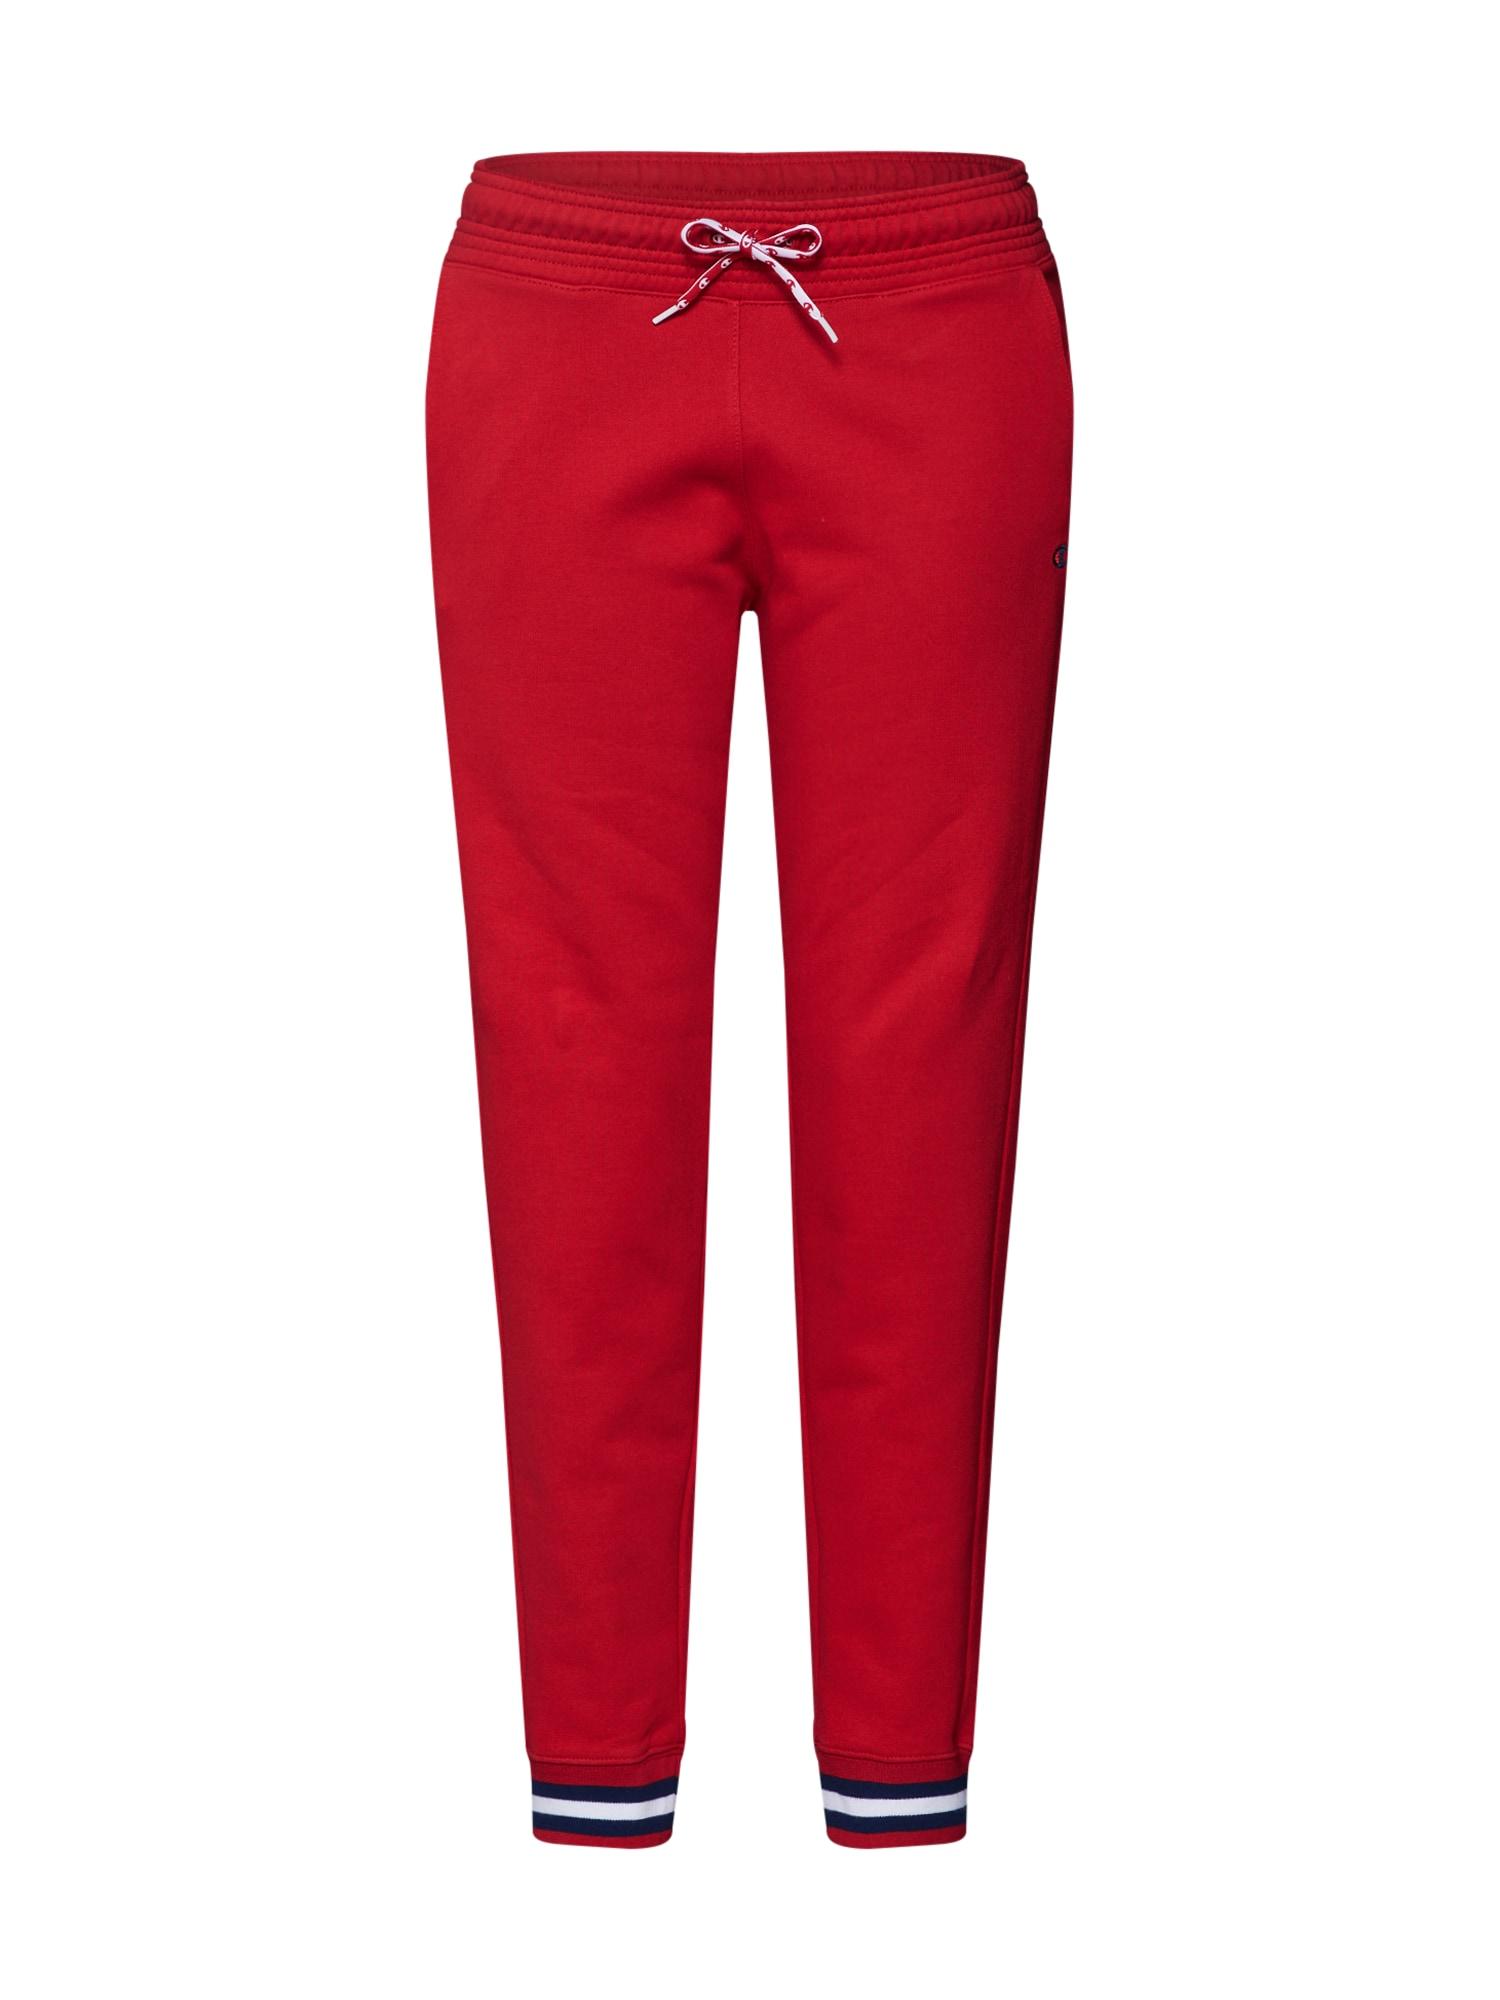 Kalhoty Rochester Manifesto červená bílá Champion Authentic Athletic Apparel